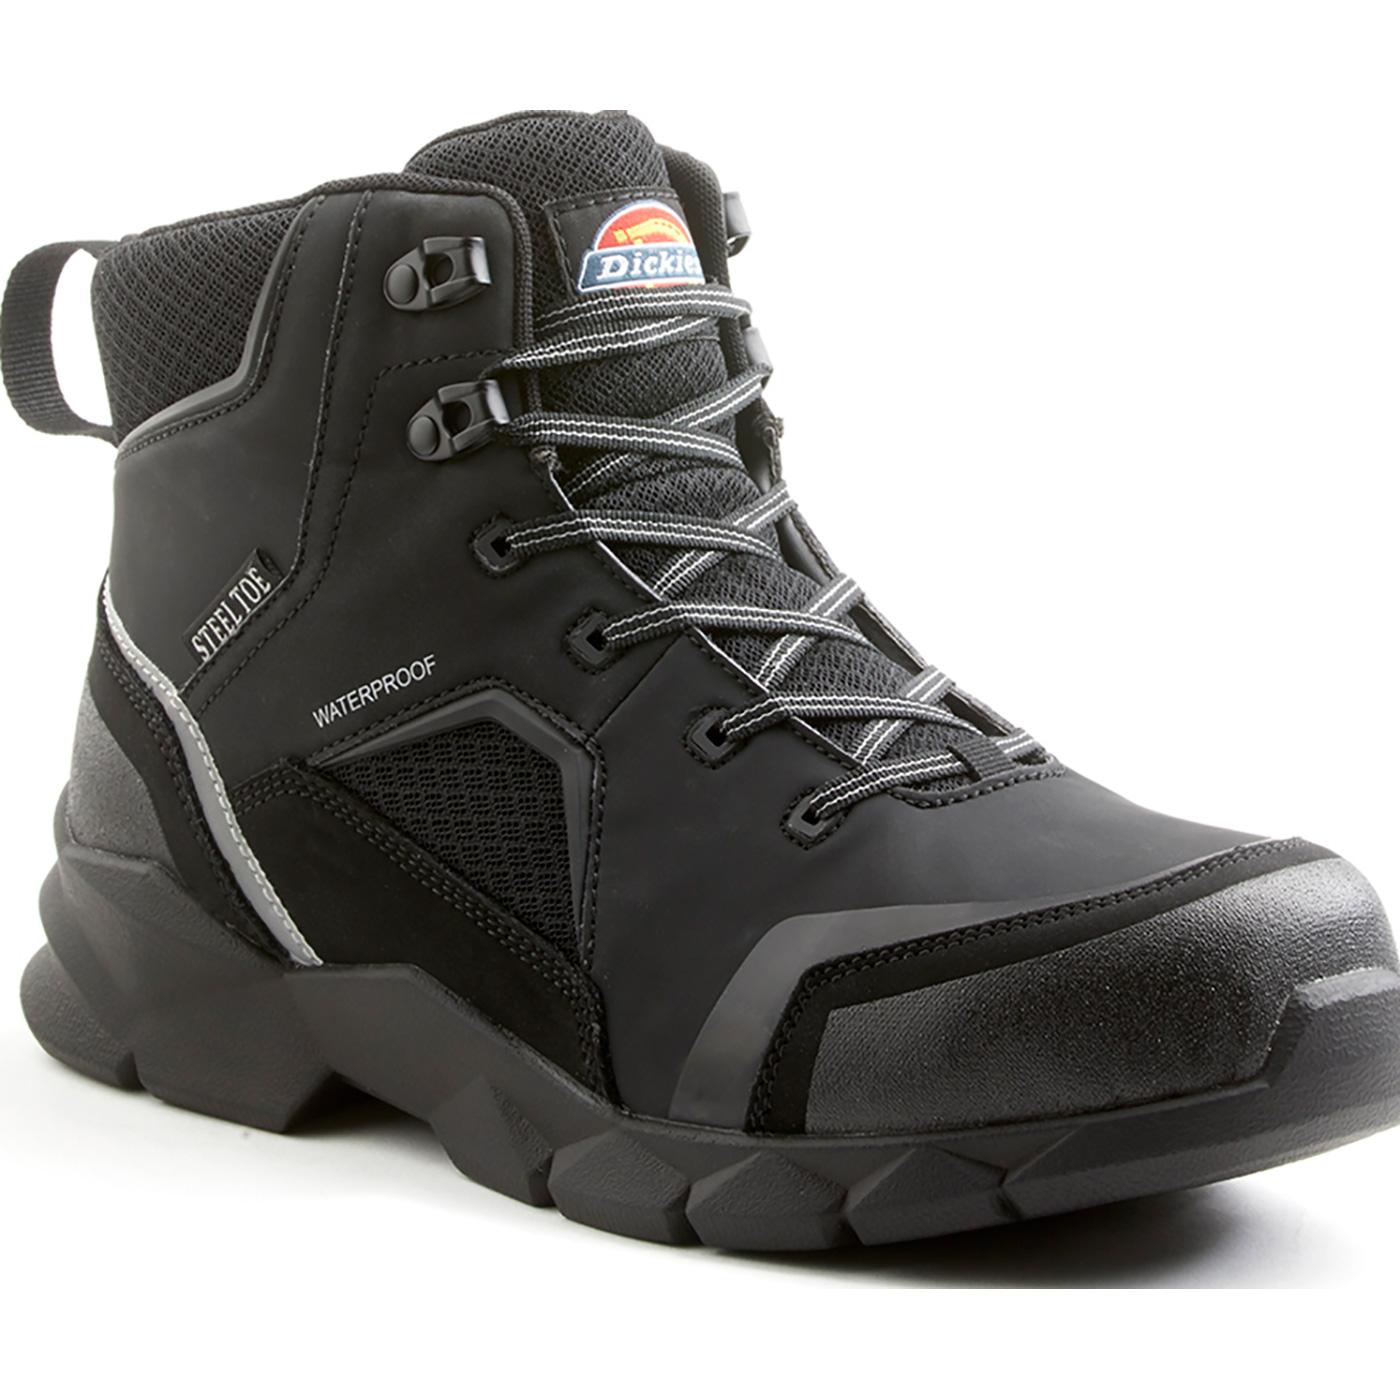 6060e4a5a61 Dickies Corvus Men's 6 inch Steel Toe Electrical Hazard Waterproof Work  Hiker